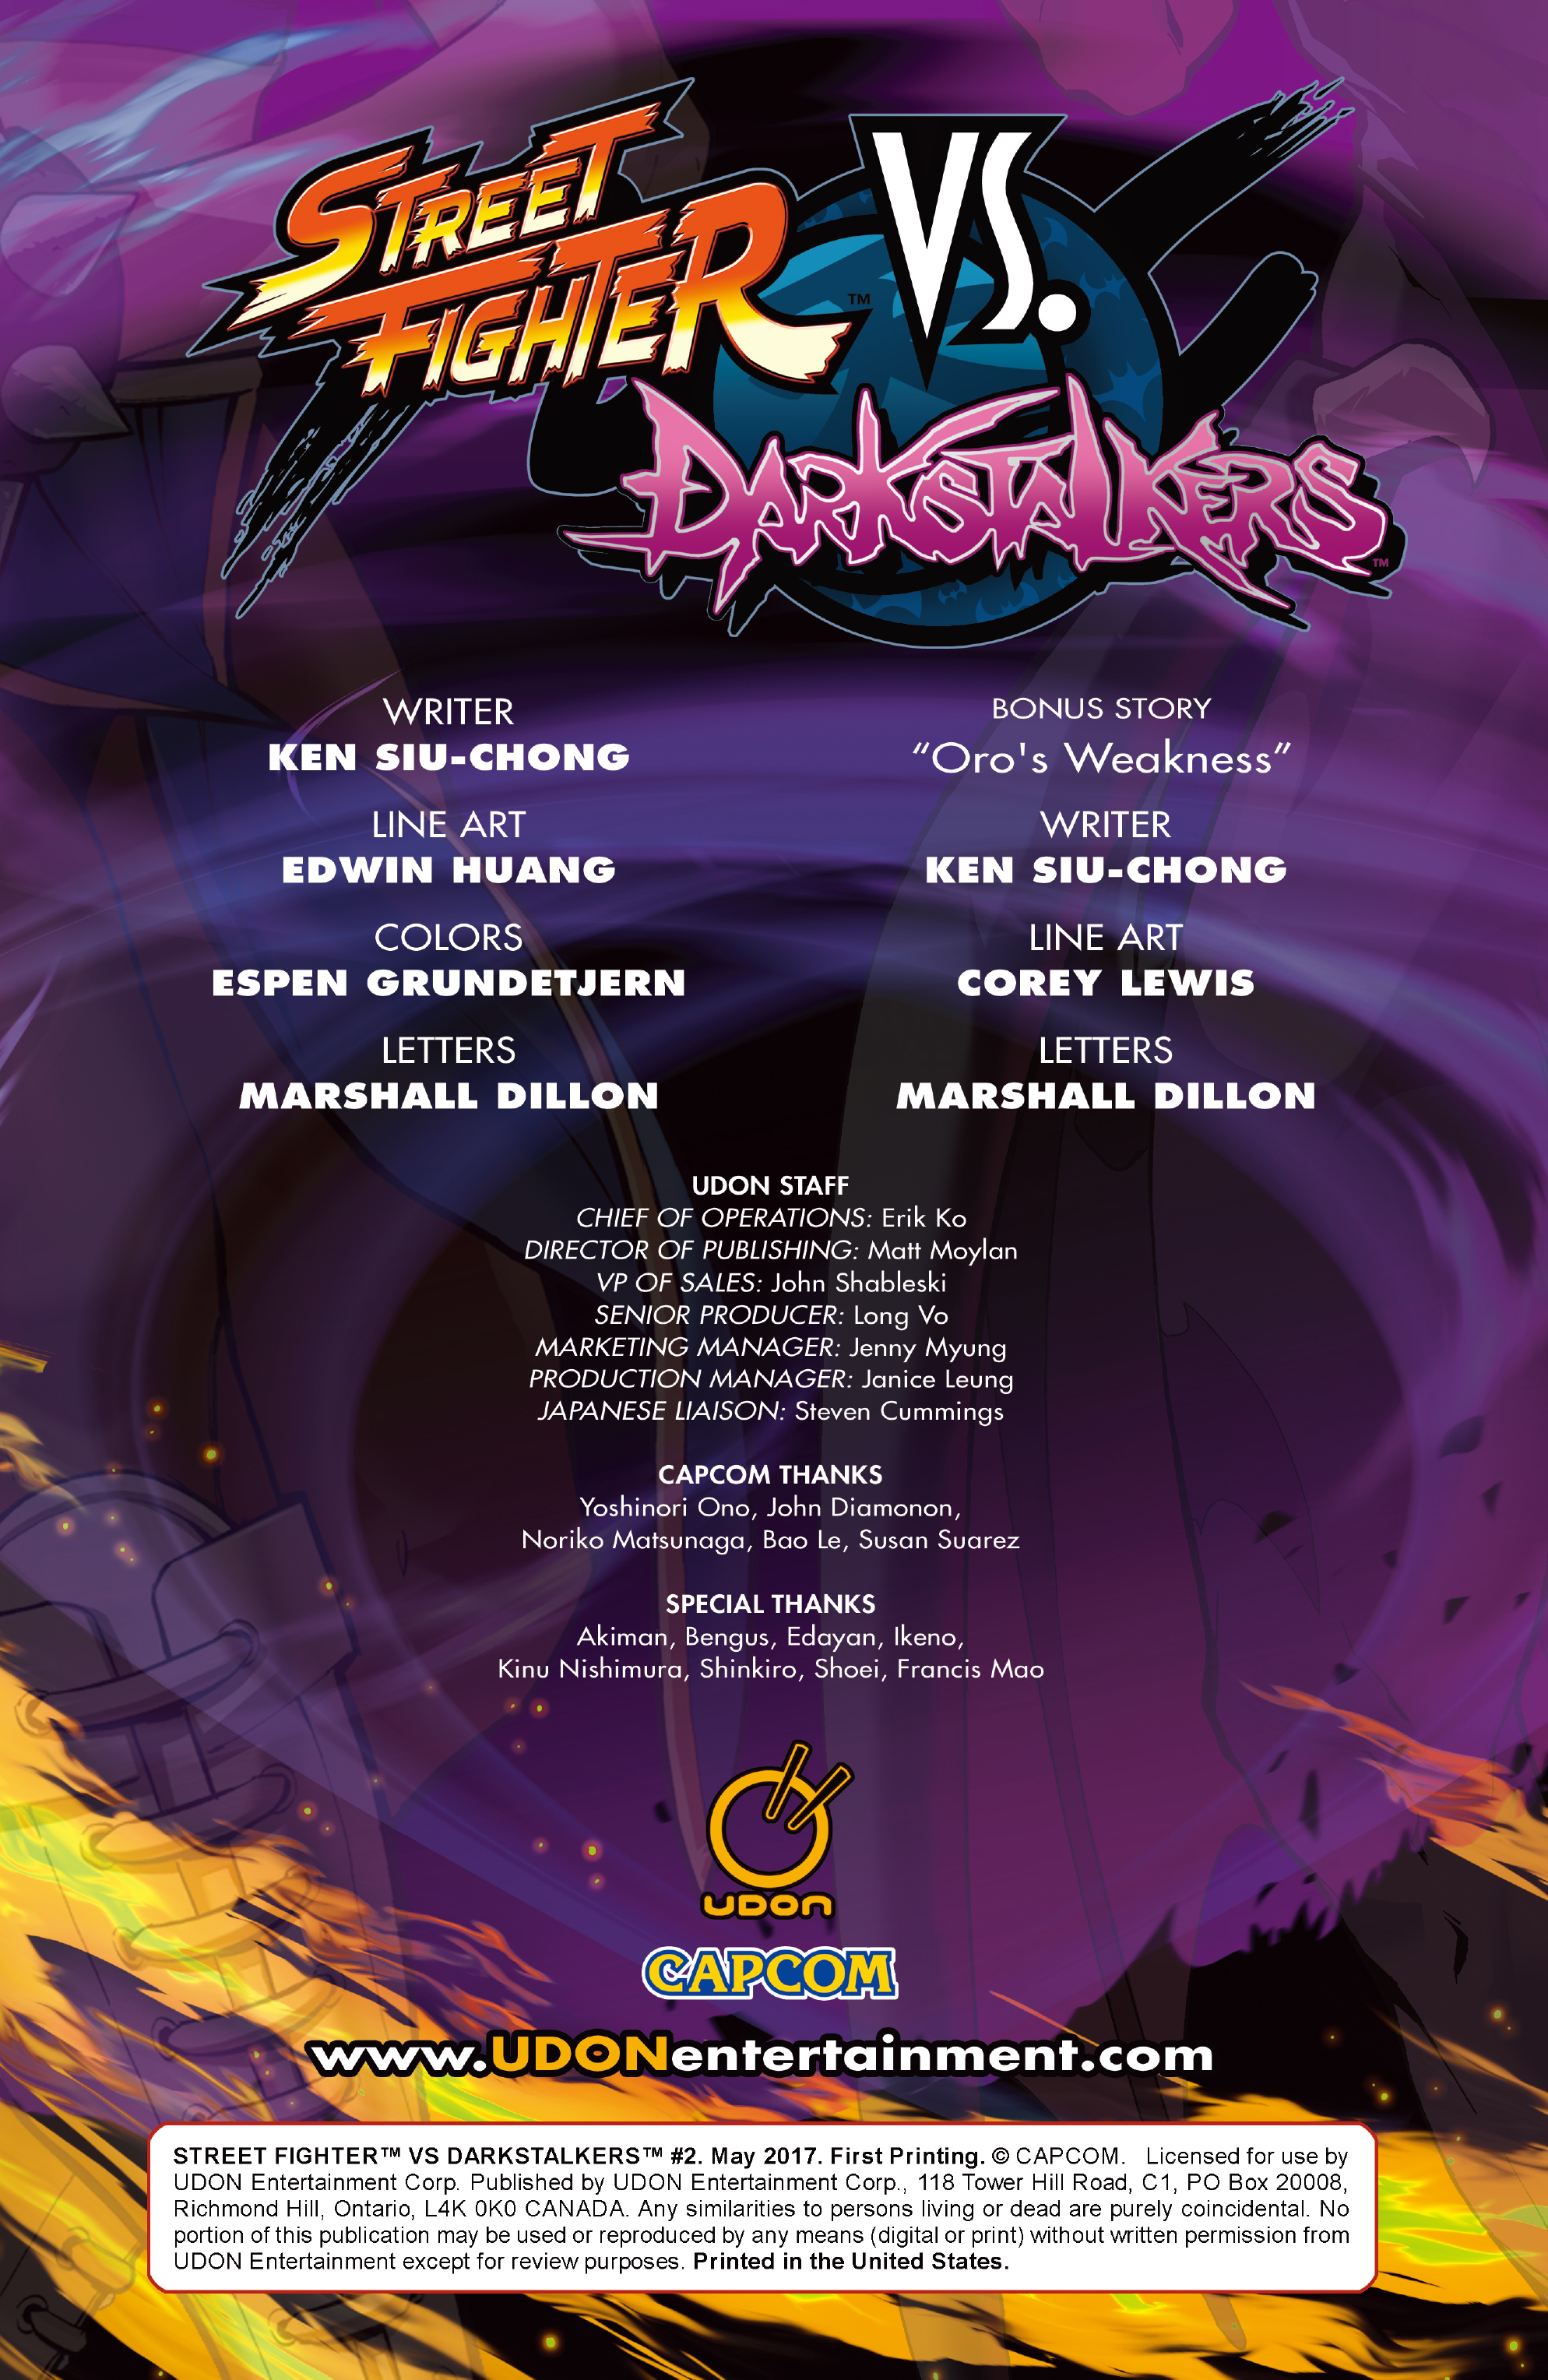 Read online Street Fighter VS Darkstalkers comic -  Issue #2 - 2